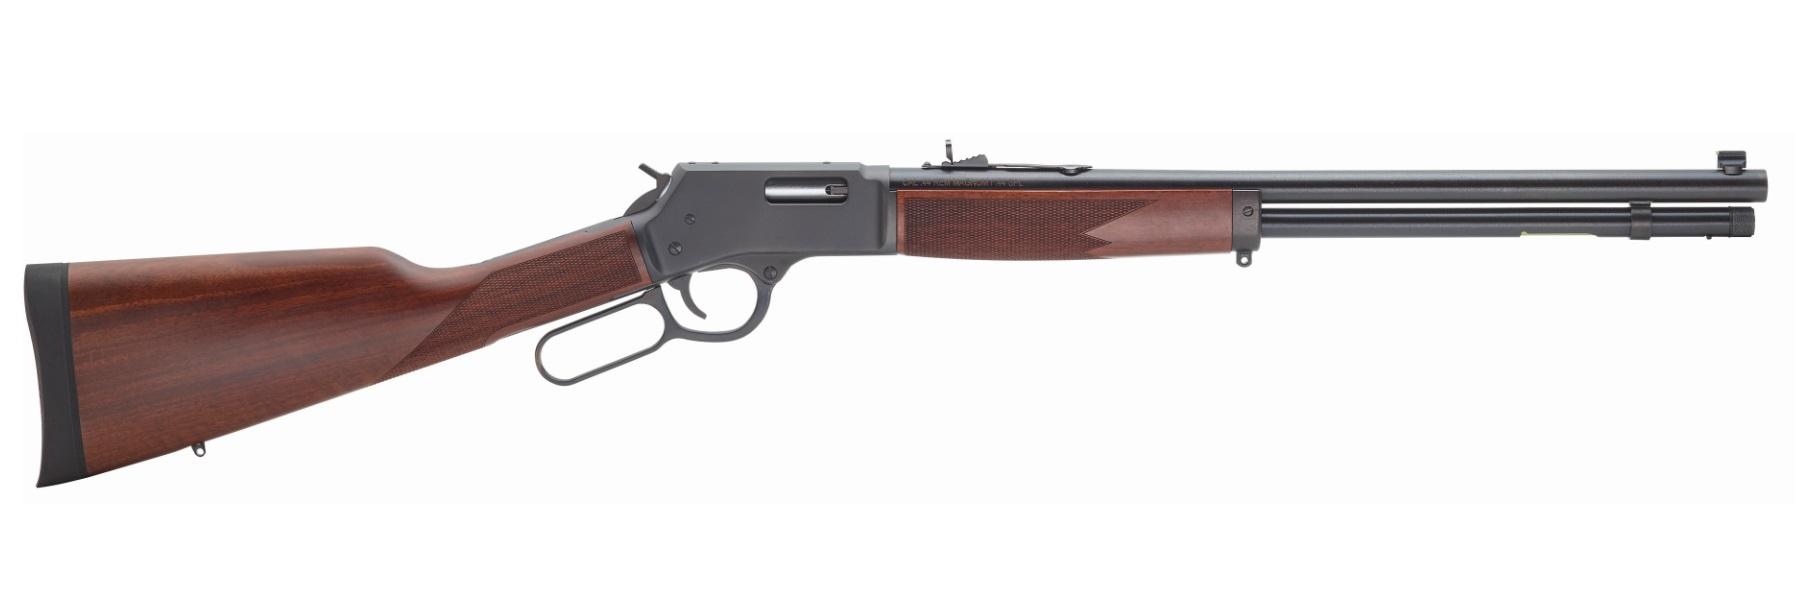 Henry Repeating Arms Big Boy Steel 327 Federal Magnum